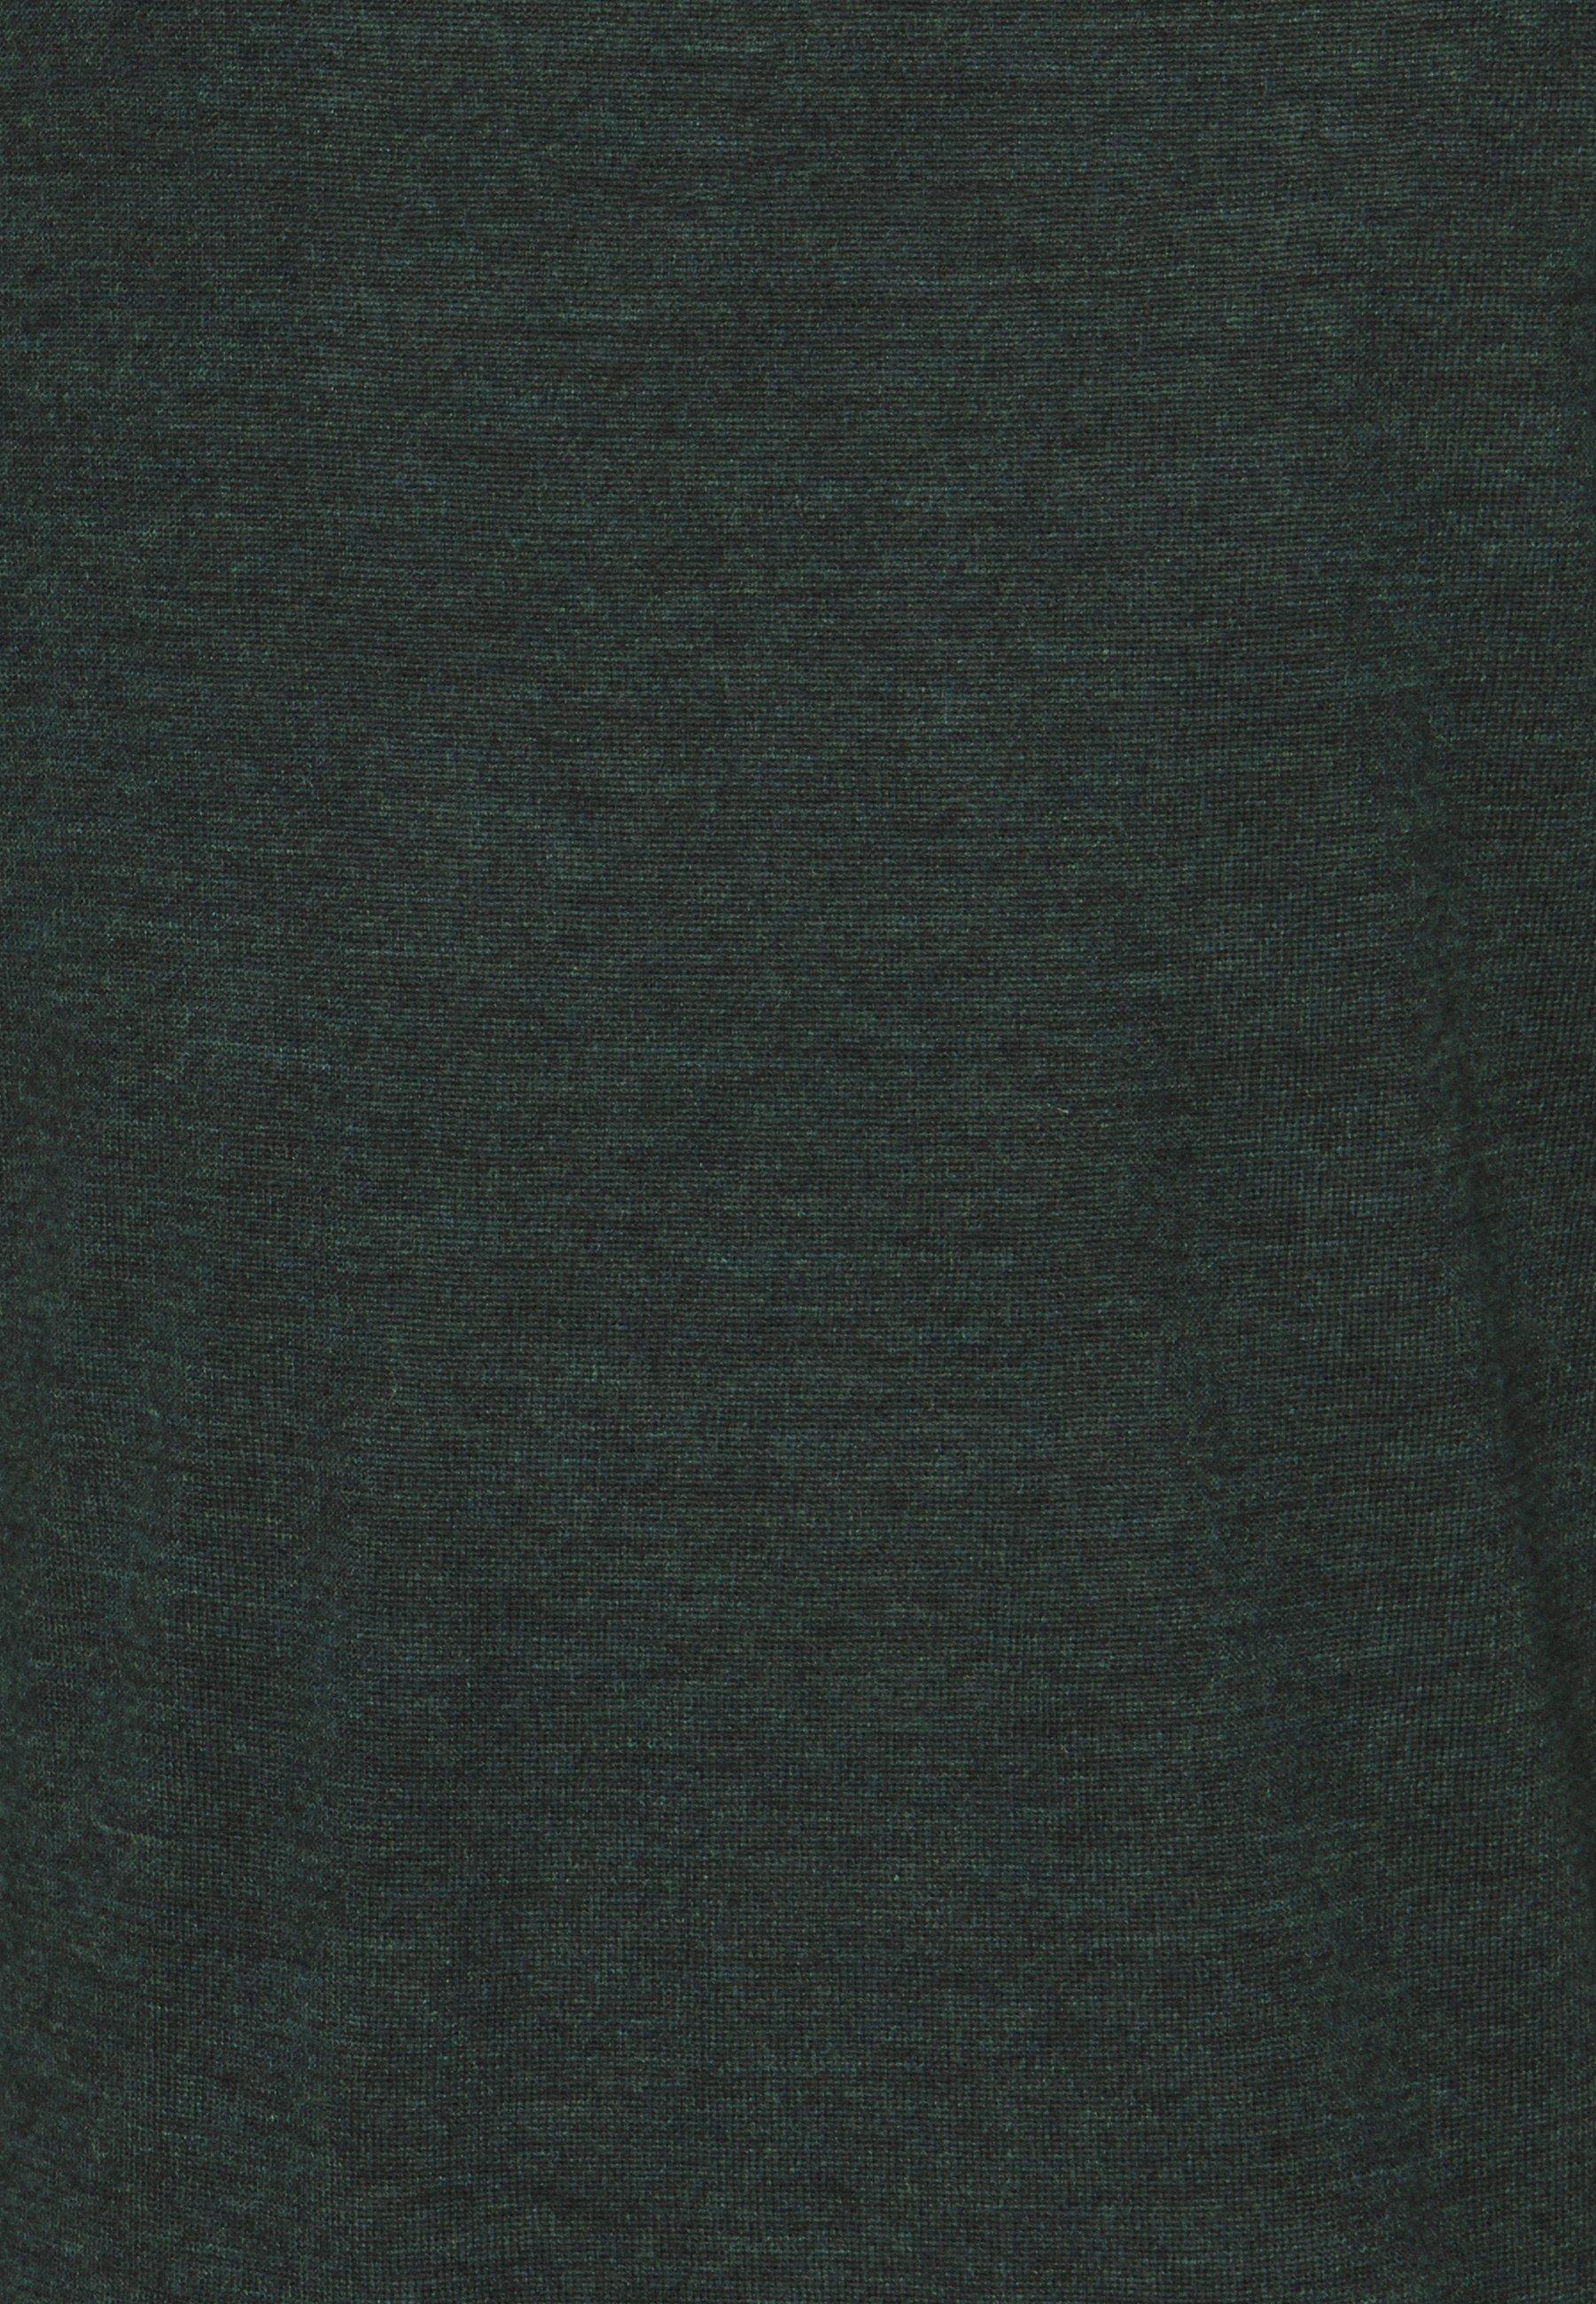 Paul Smith GENTS CREW NECK - Stickad tröja - black/svart - Herr Vinterkläder 6yABK